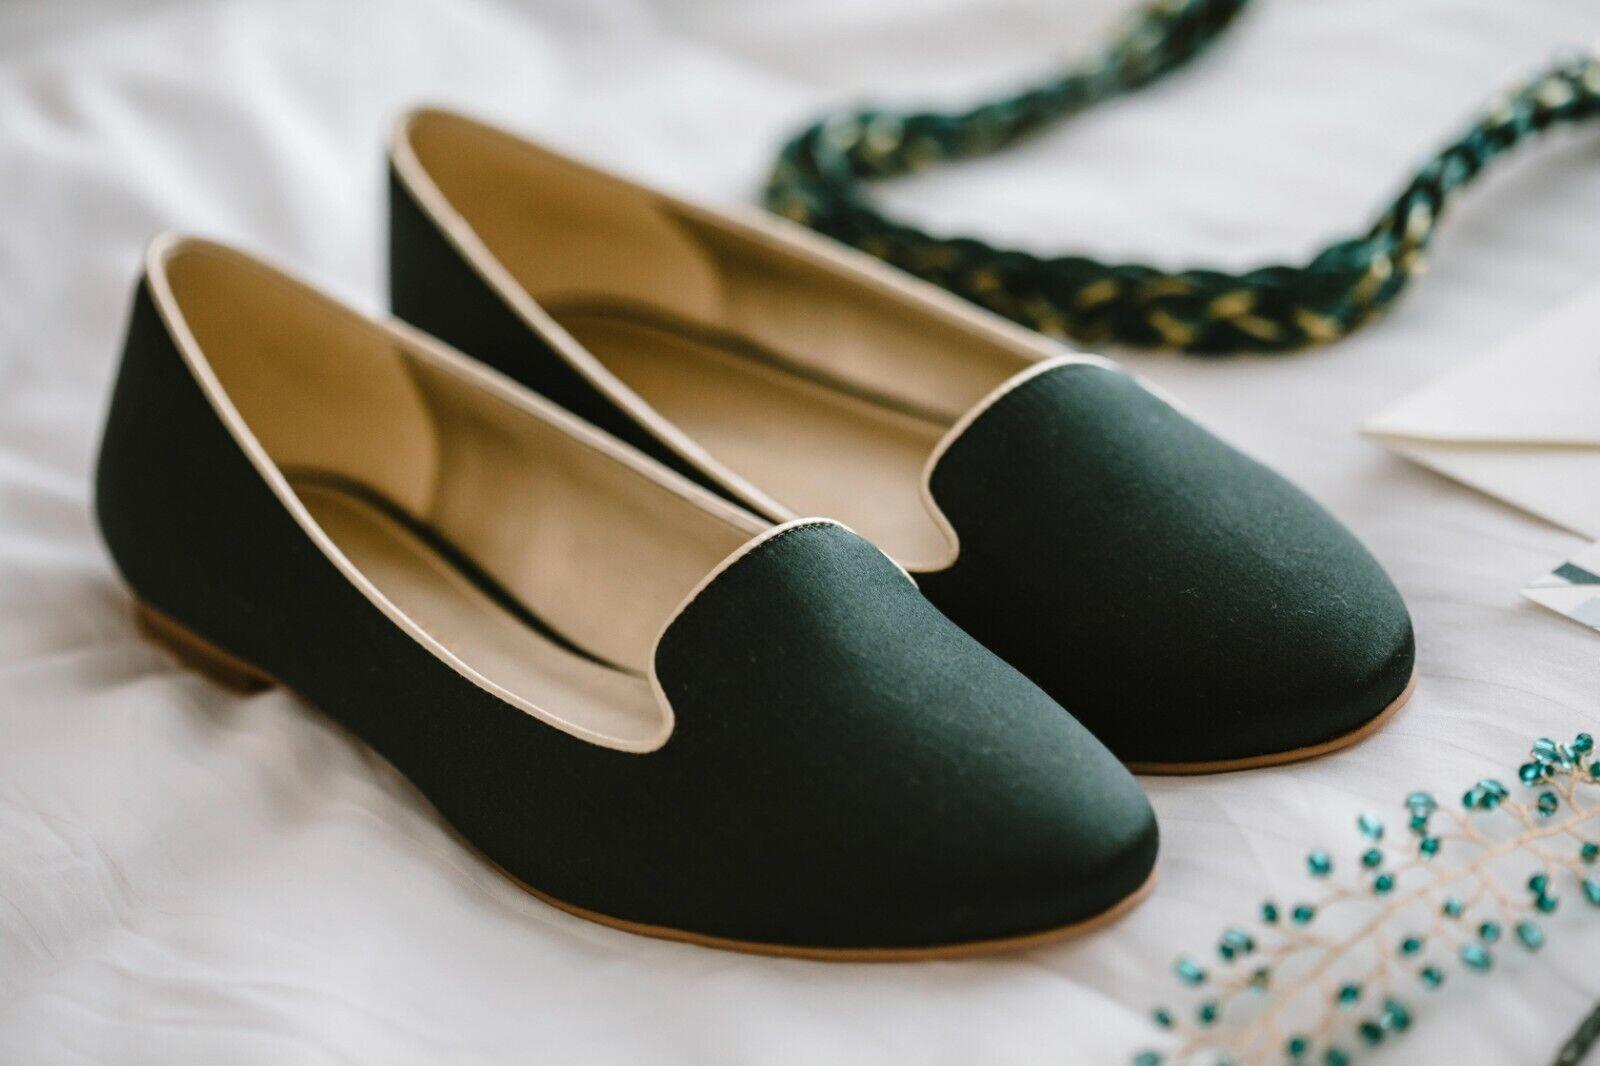 Emerald Green Women's Women's Women's Silk Loafers with gold Trim - NEVER WORN 40b66a